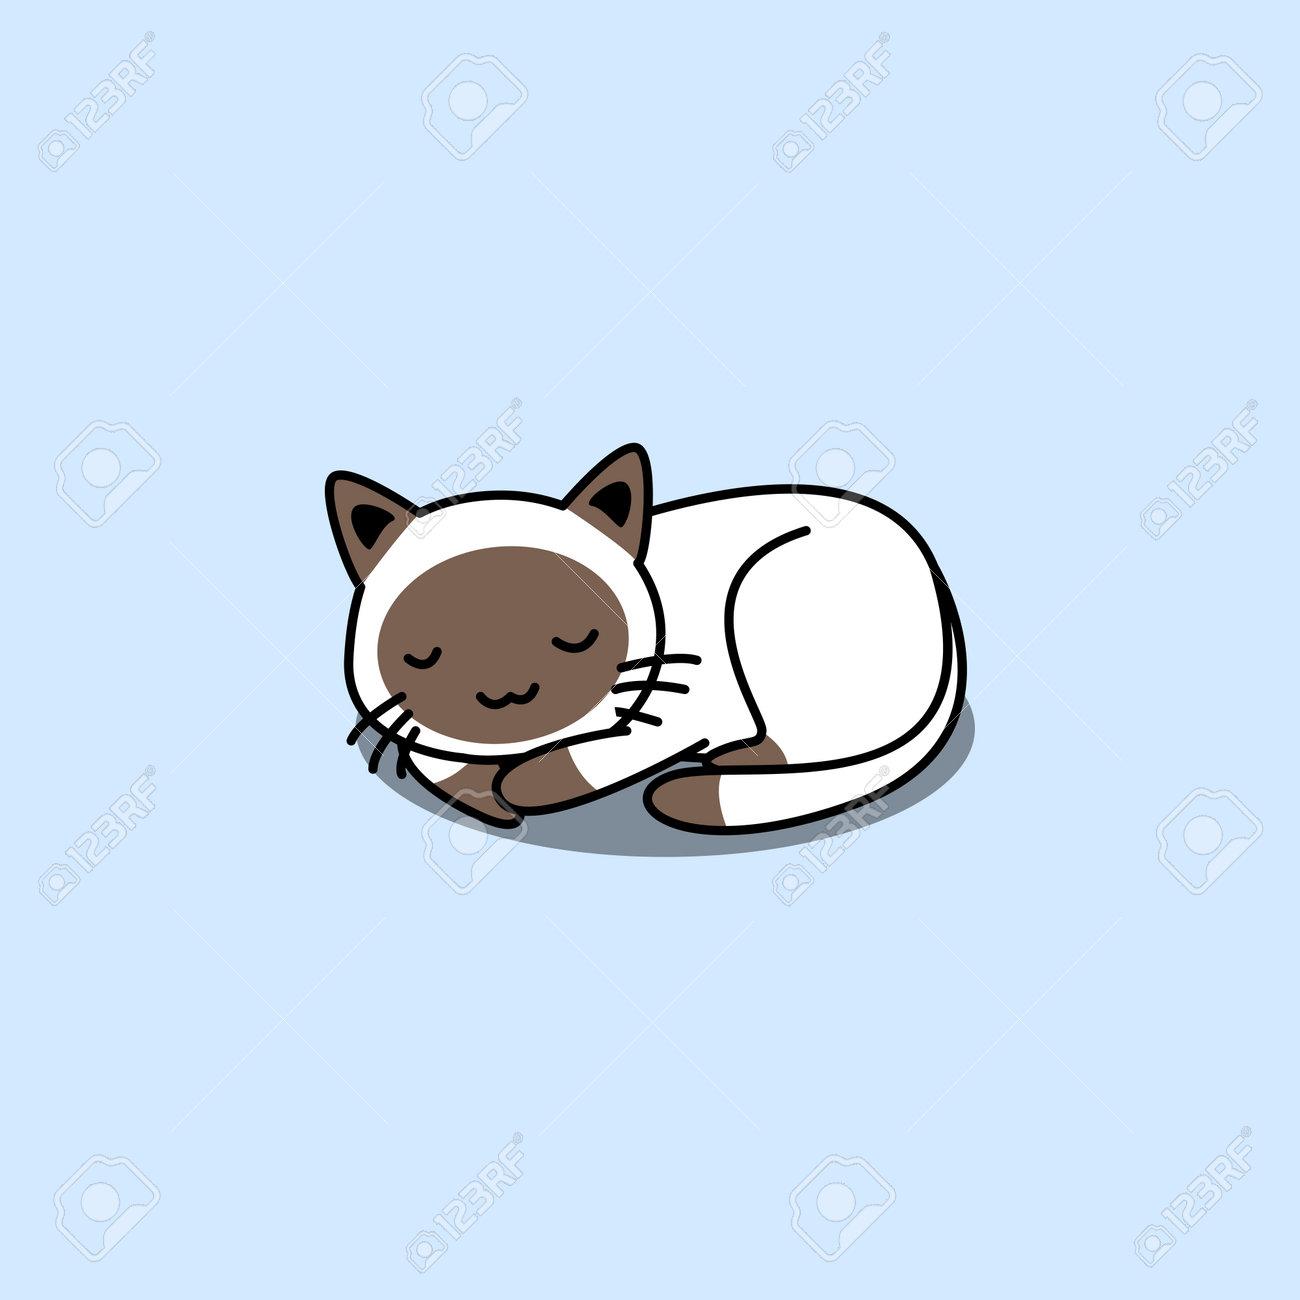 Cute siamese cat sleeping cartoon, vector illustration - 169151624